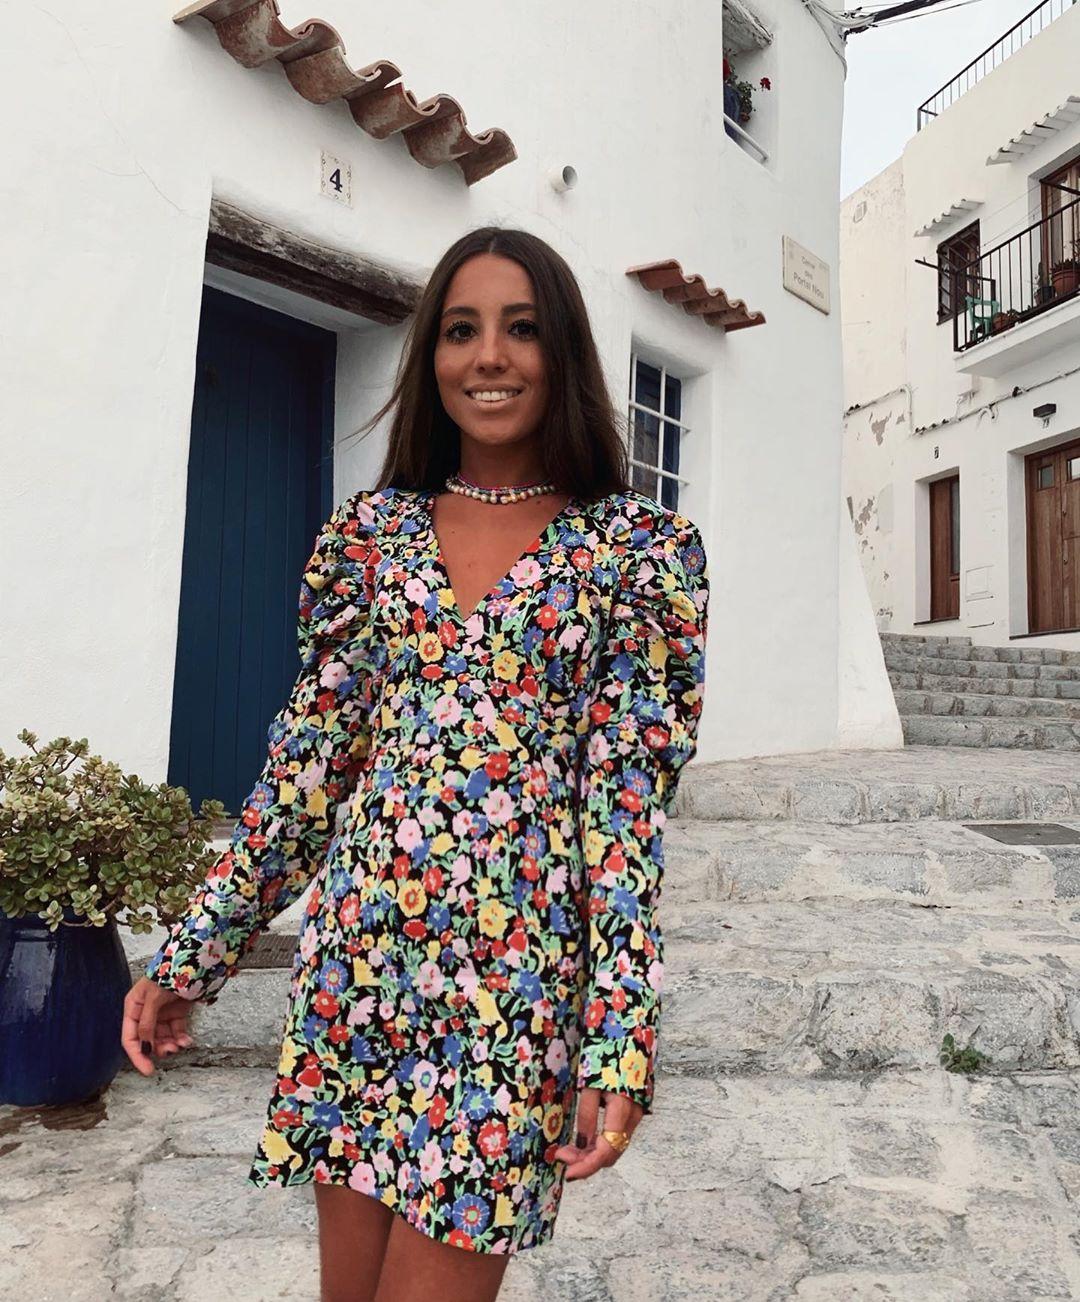 short dress with volume sleeve de Zara sur gpalazuelos